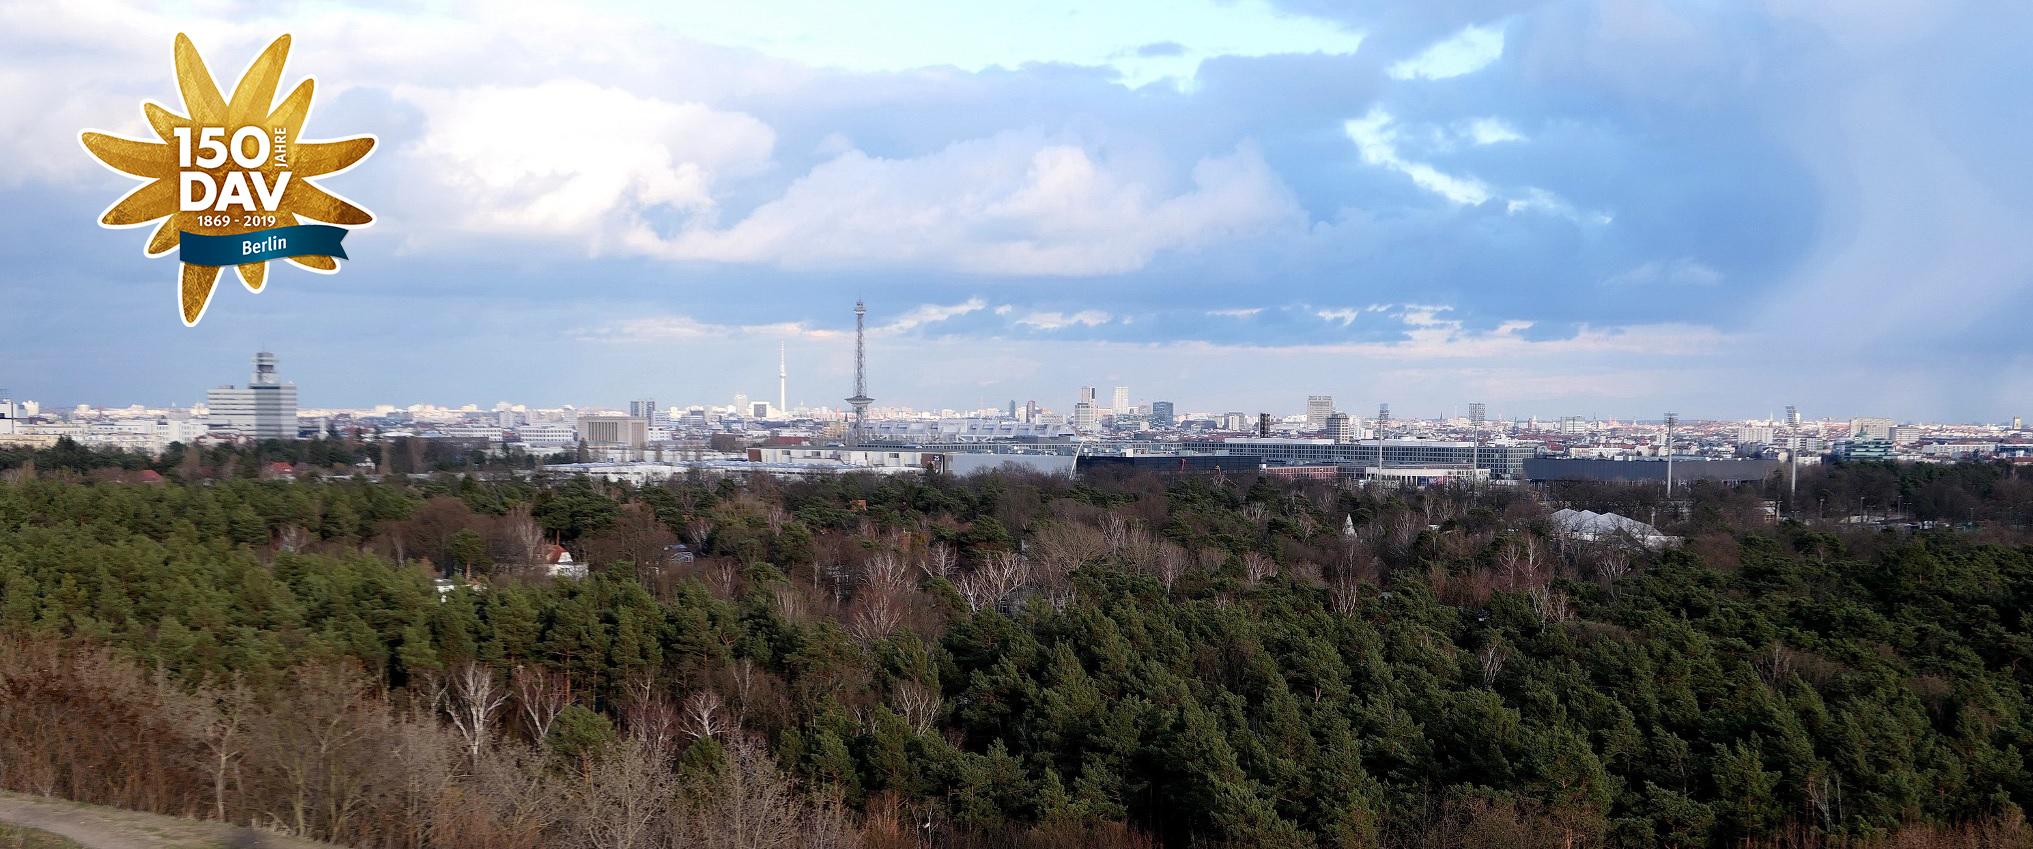 Blick vom Drachenberg zum Funkturm. Foto: Udo Preugschat